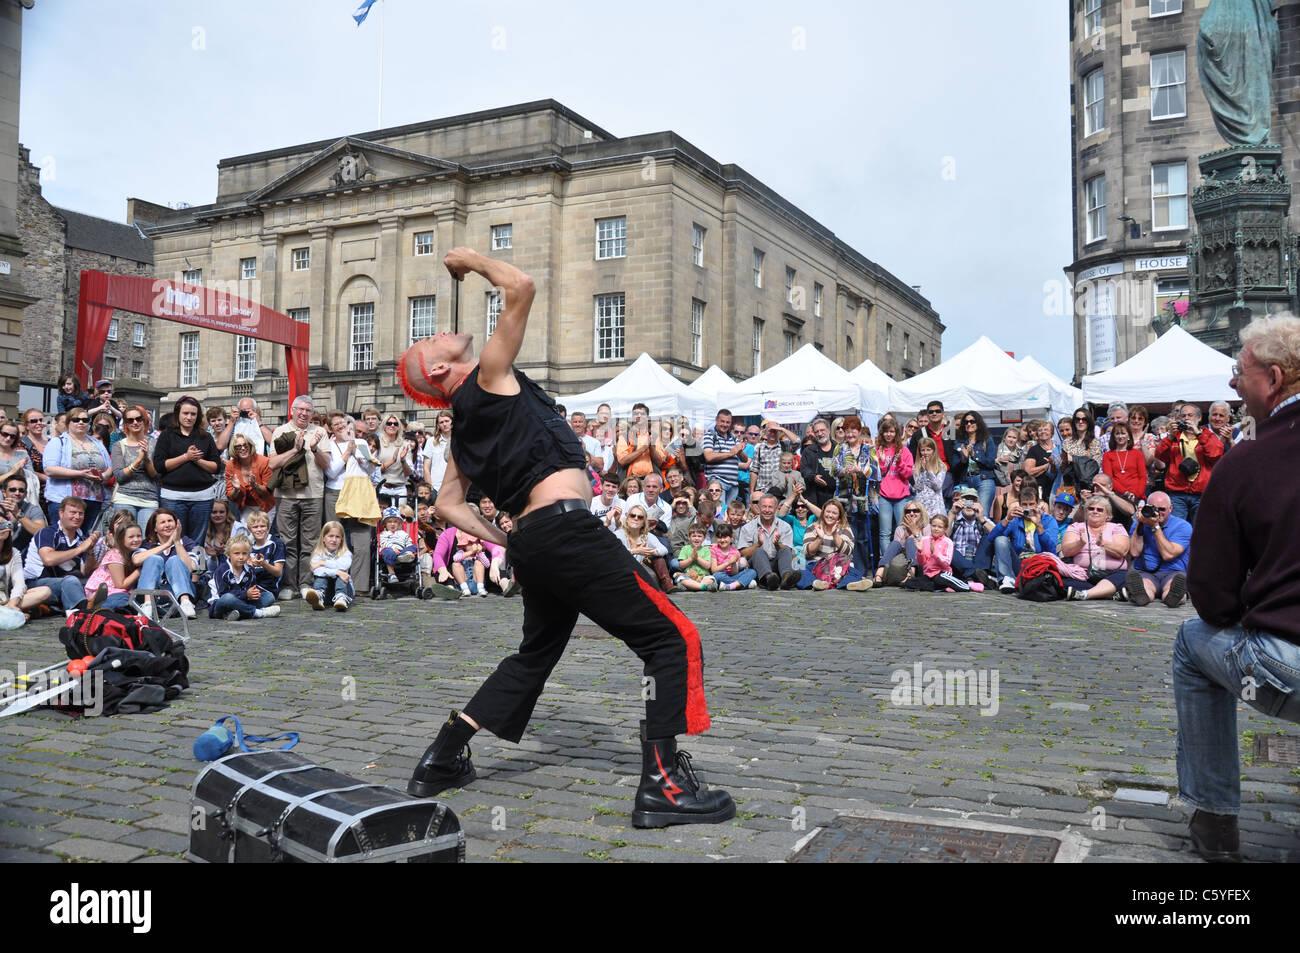 The Mighty Gareth, Street Performer at Edinburgh Fringe 2011 - Stock Image